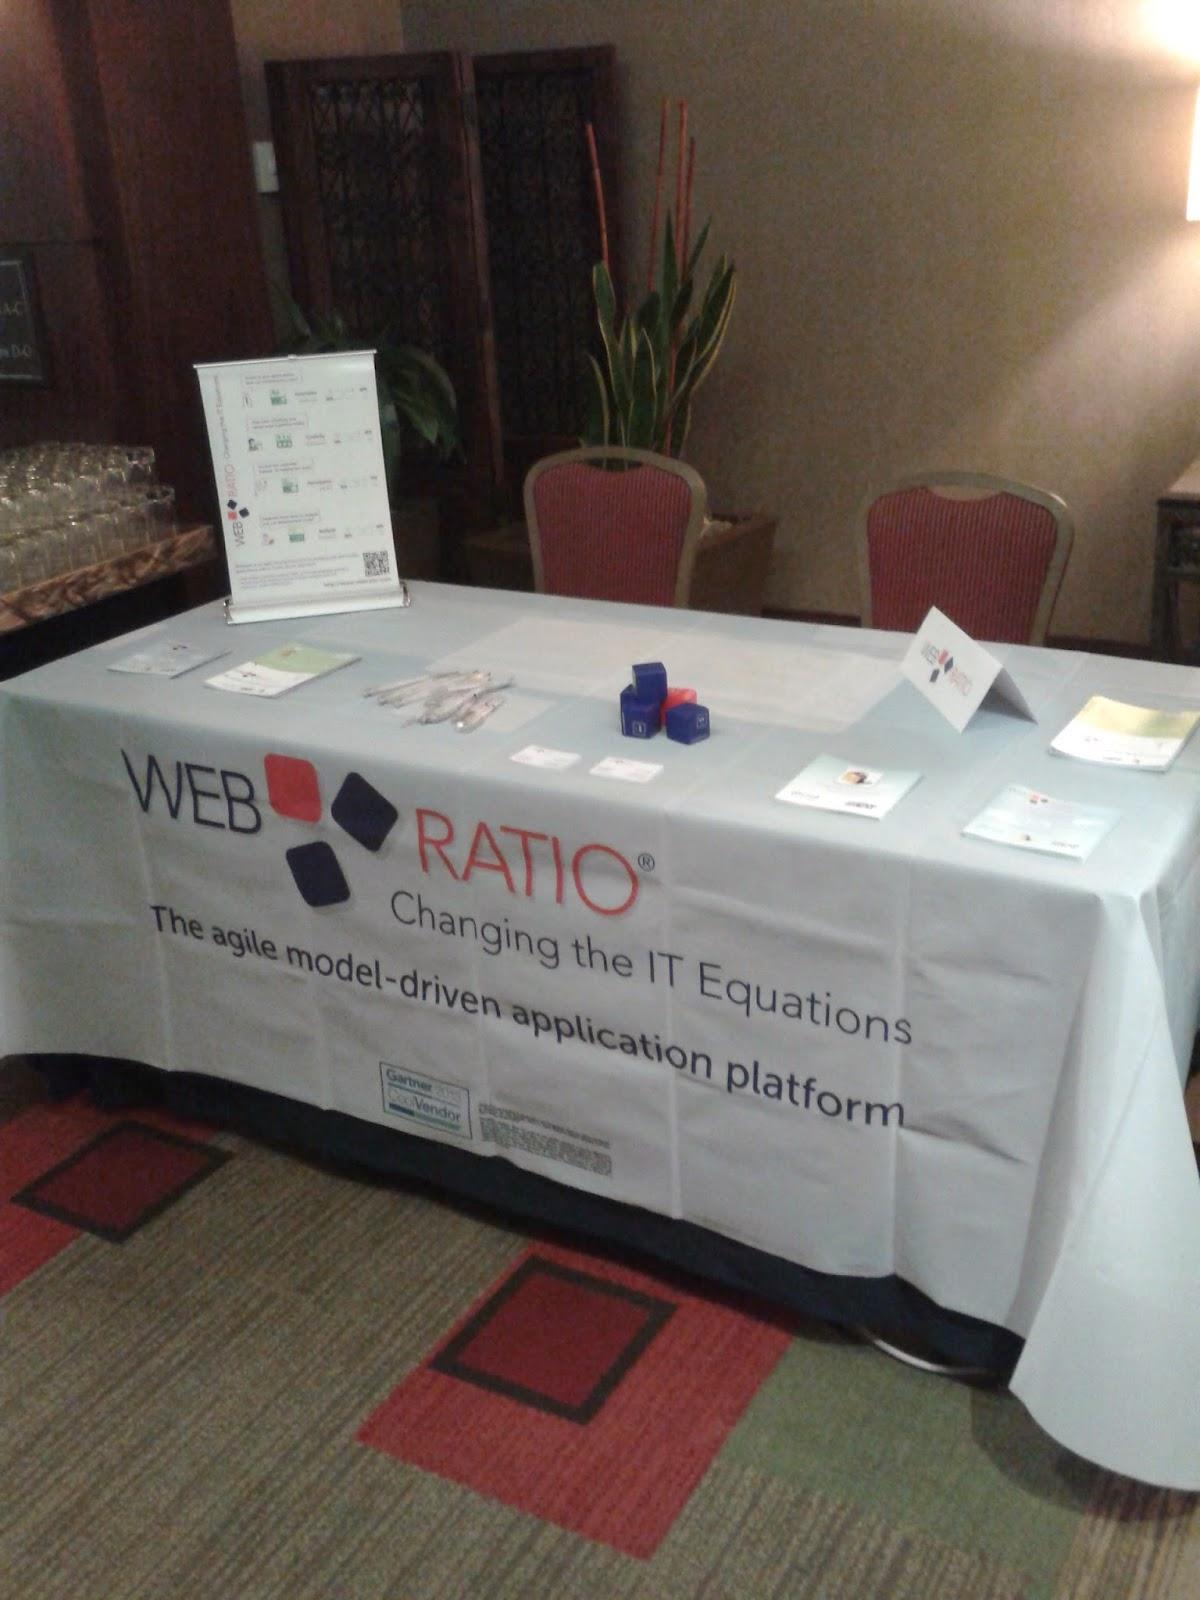 WebRatio booth